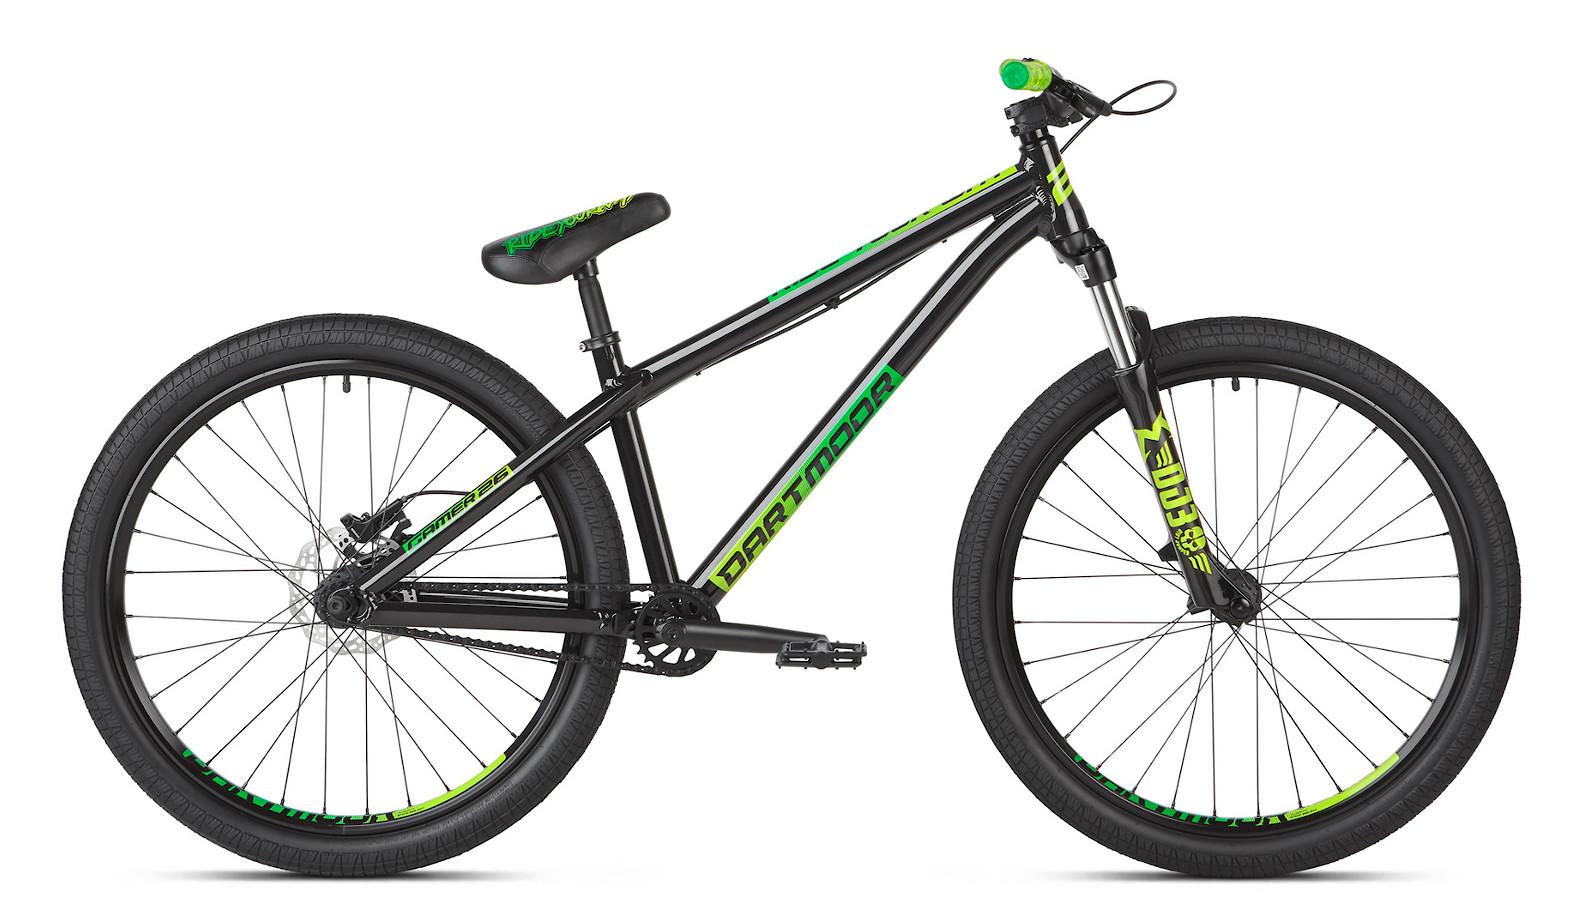 2019 Dartmoor Gamer 26 Bike